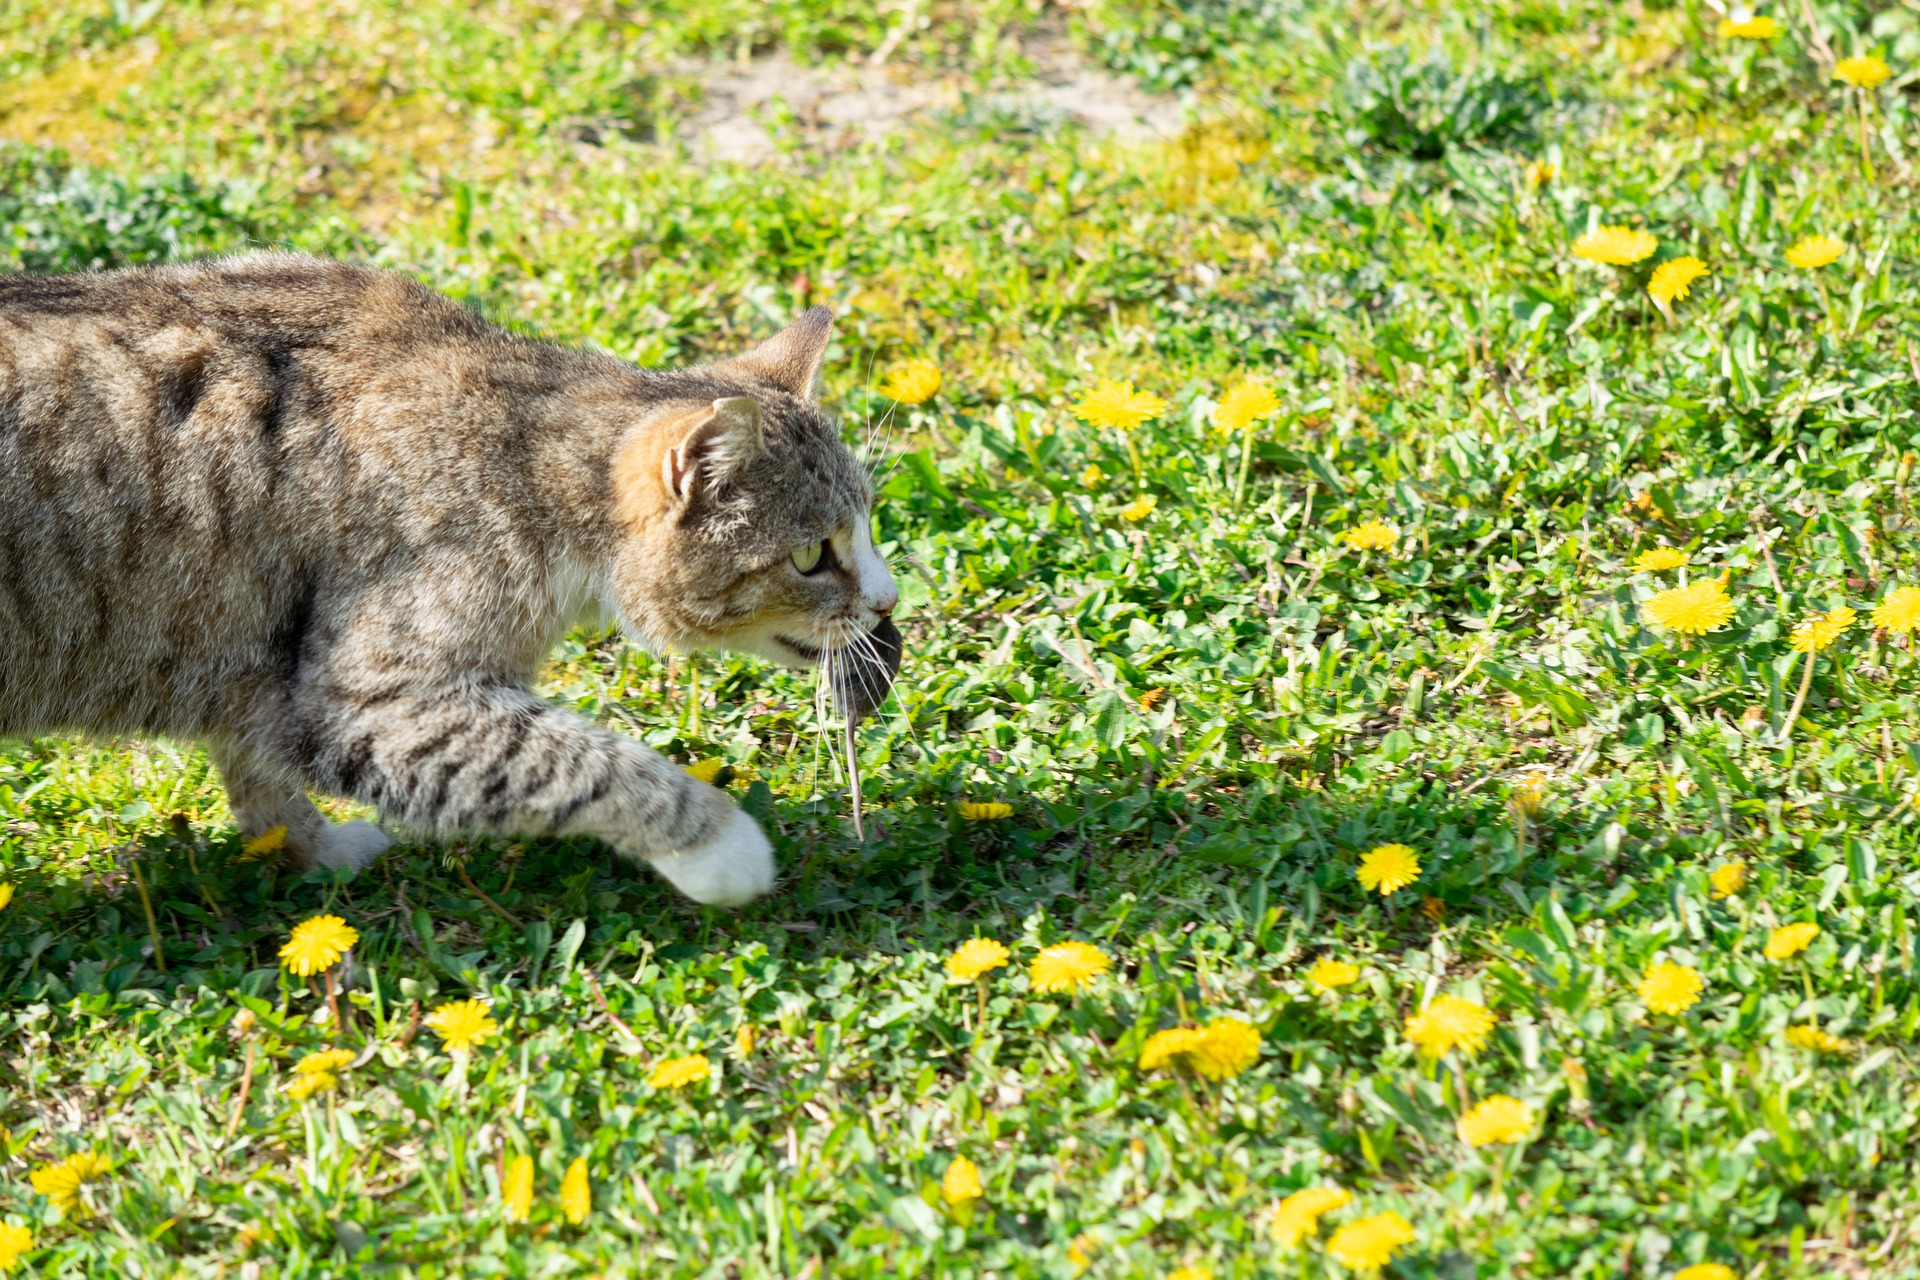 Katt og mus. Foto: Pixabay